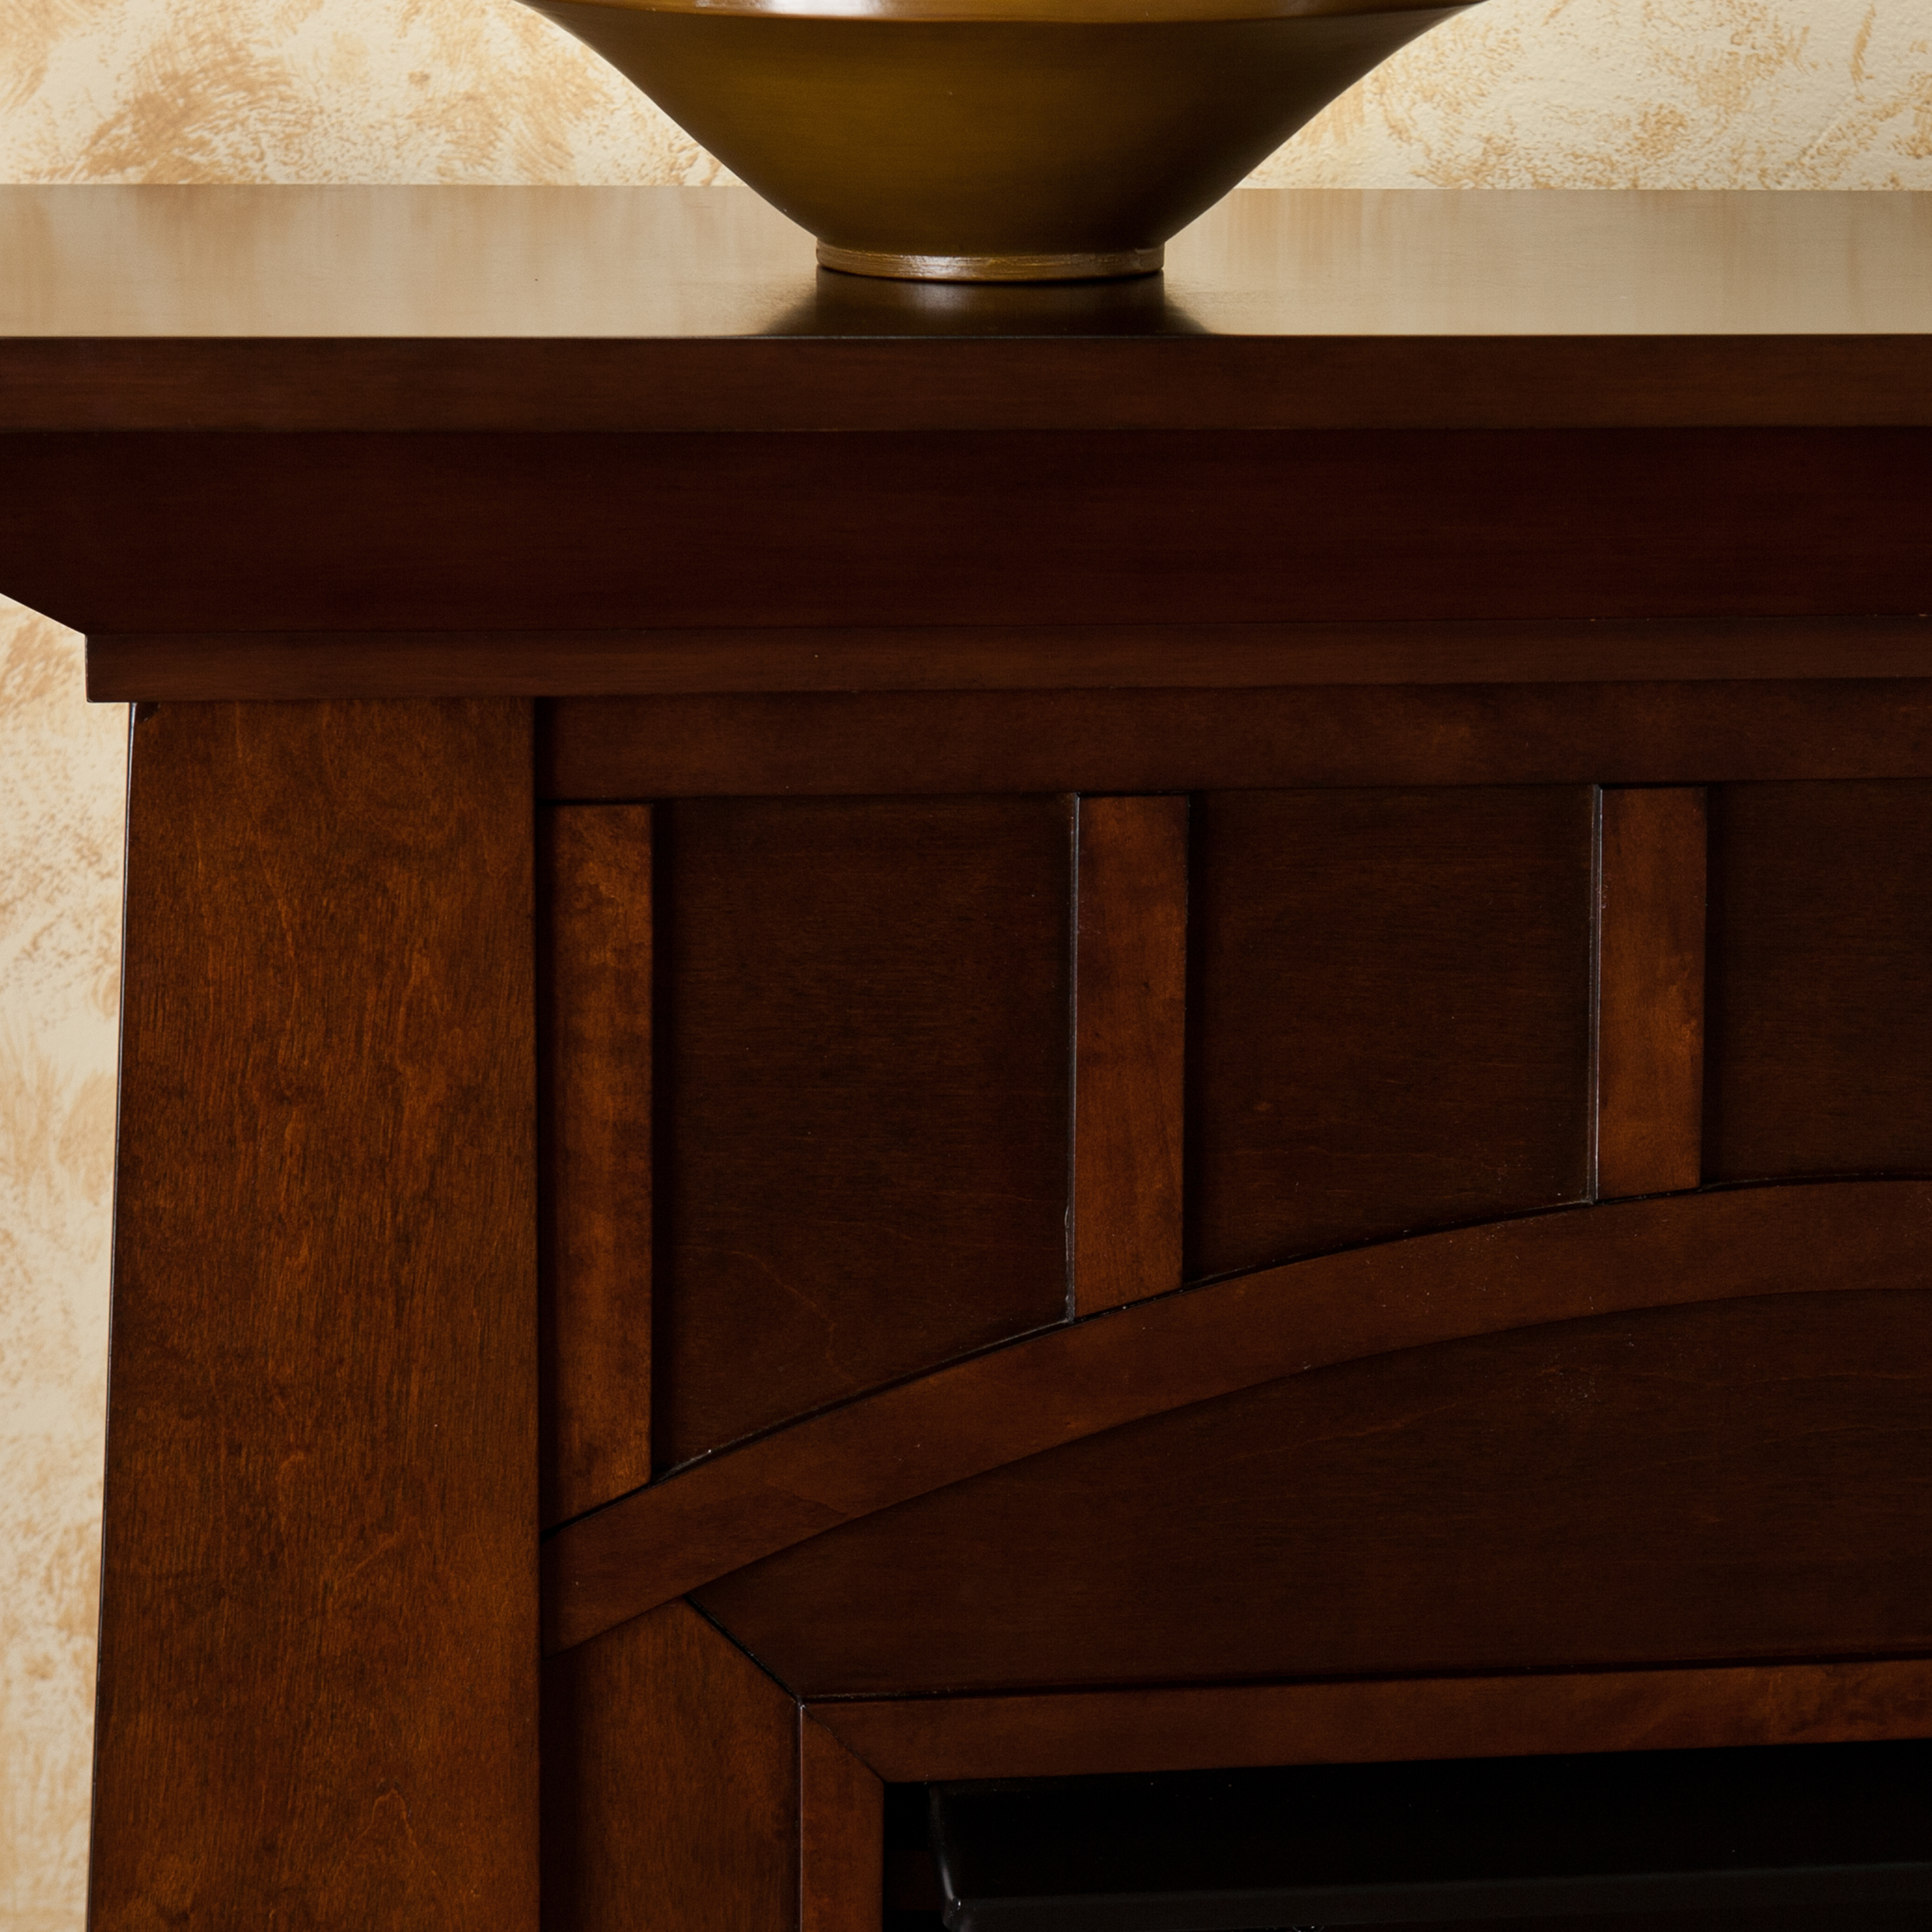 Bayard Espresso Electric Fireplace - Walmart.com